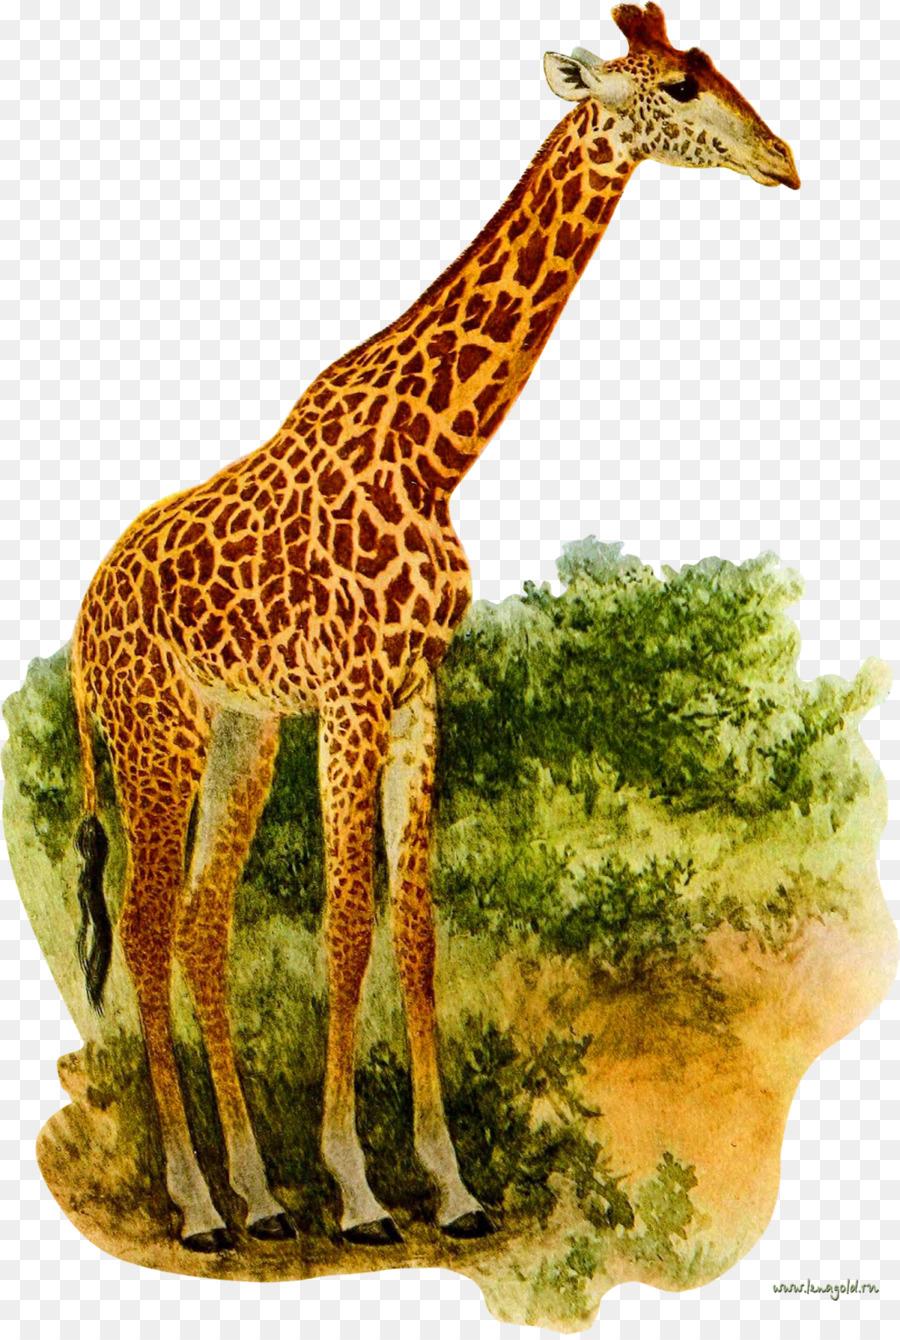 Картинки жираф для малышей